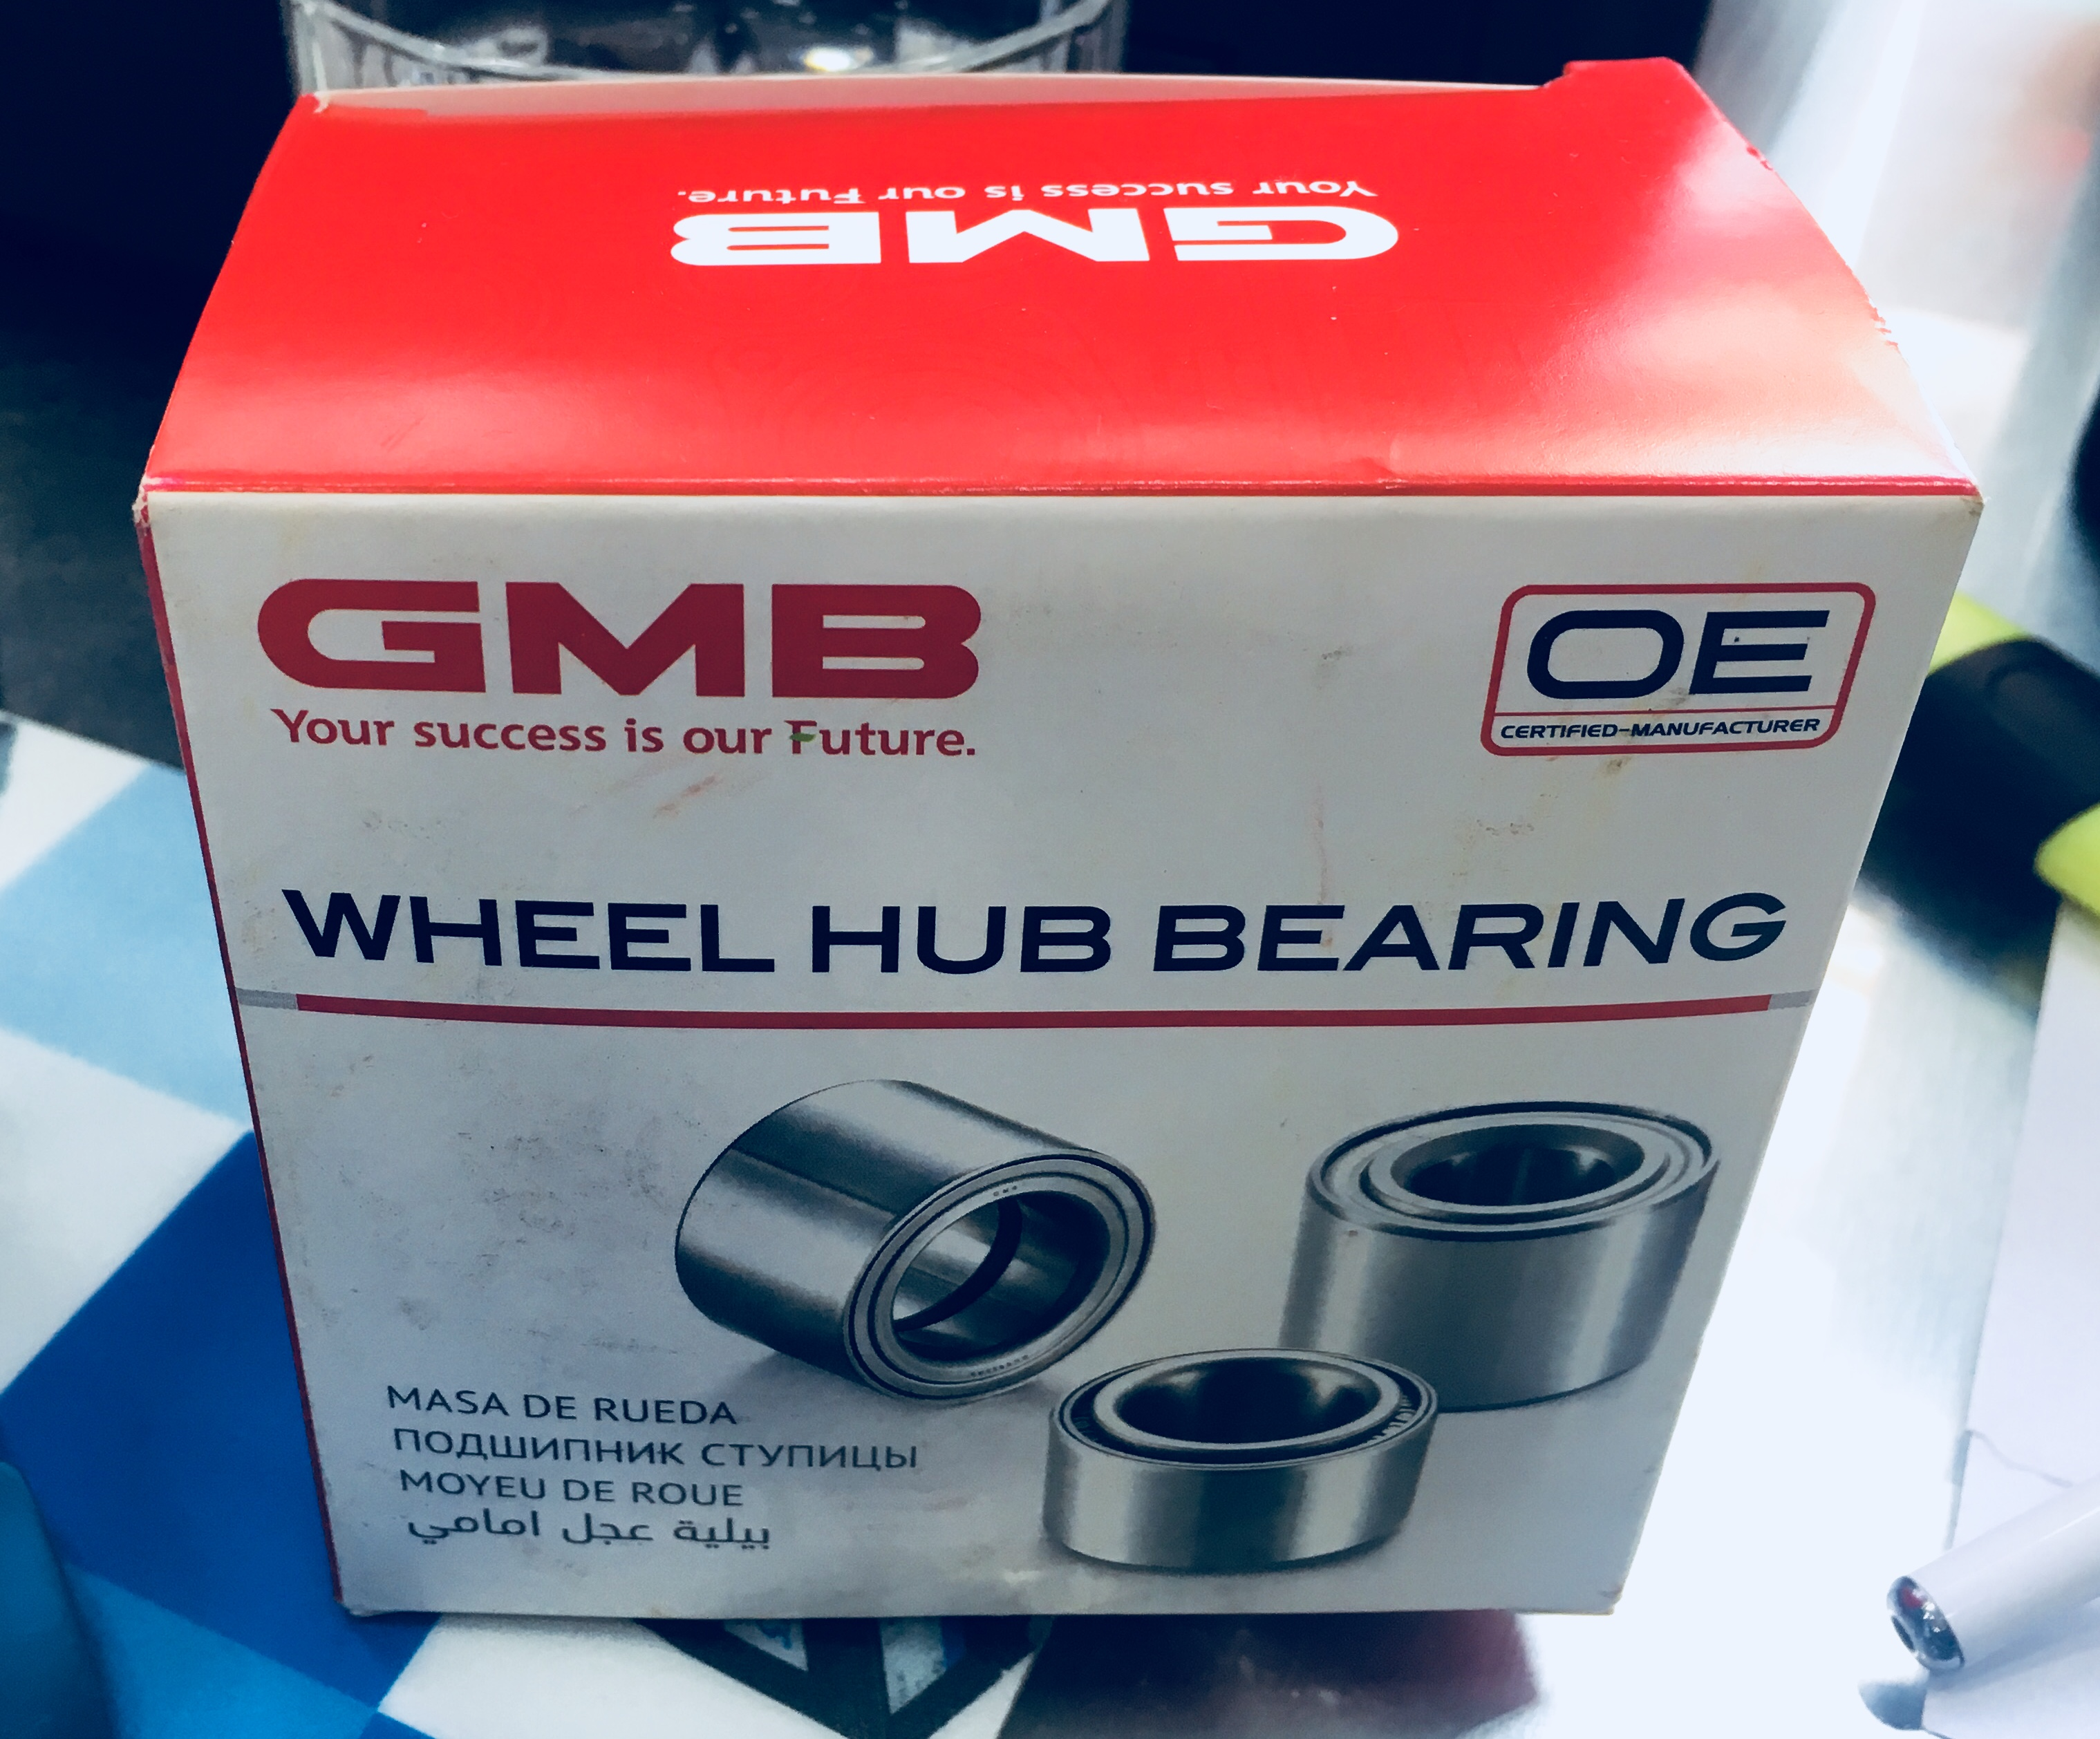 Gh0050r1 gmbkia pride bearing /42's